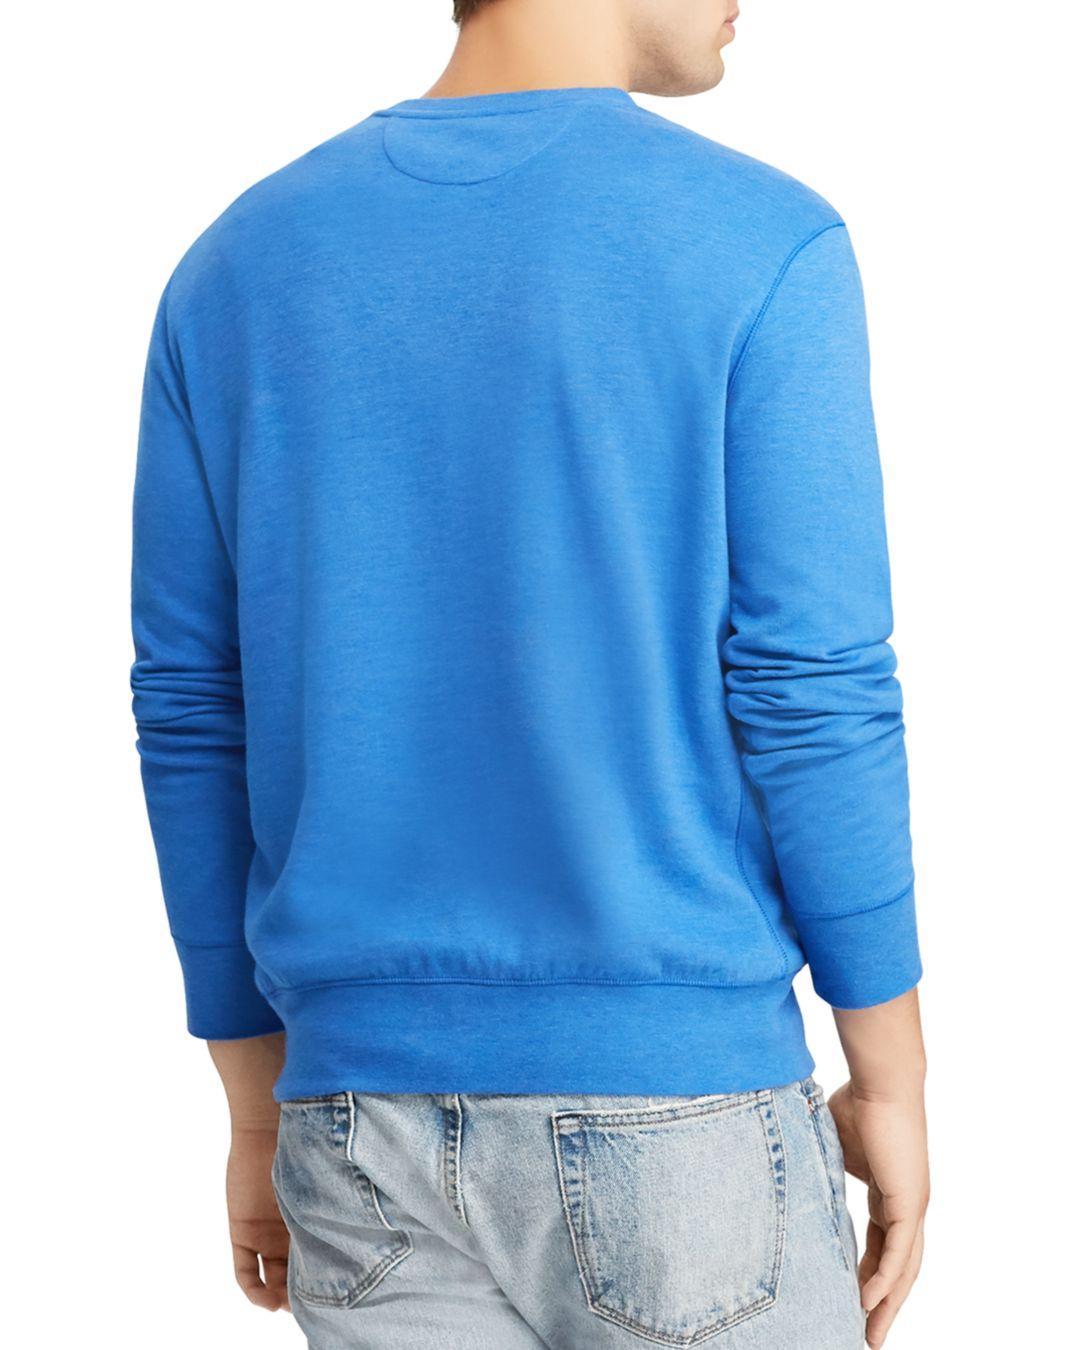 6d0e3b146ad25 Lyst - Polo Ralph Lauren Lux Jersey Crewneck Sweatshirt in Blue for Men -  Save 30%